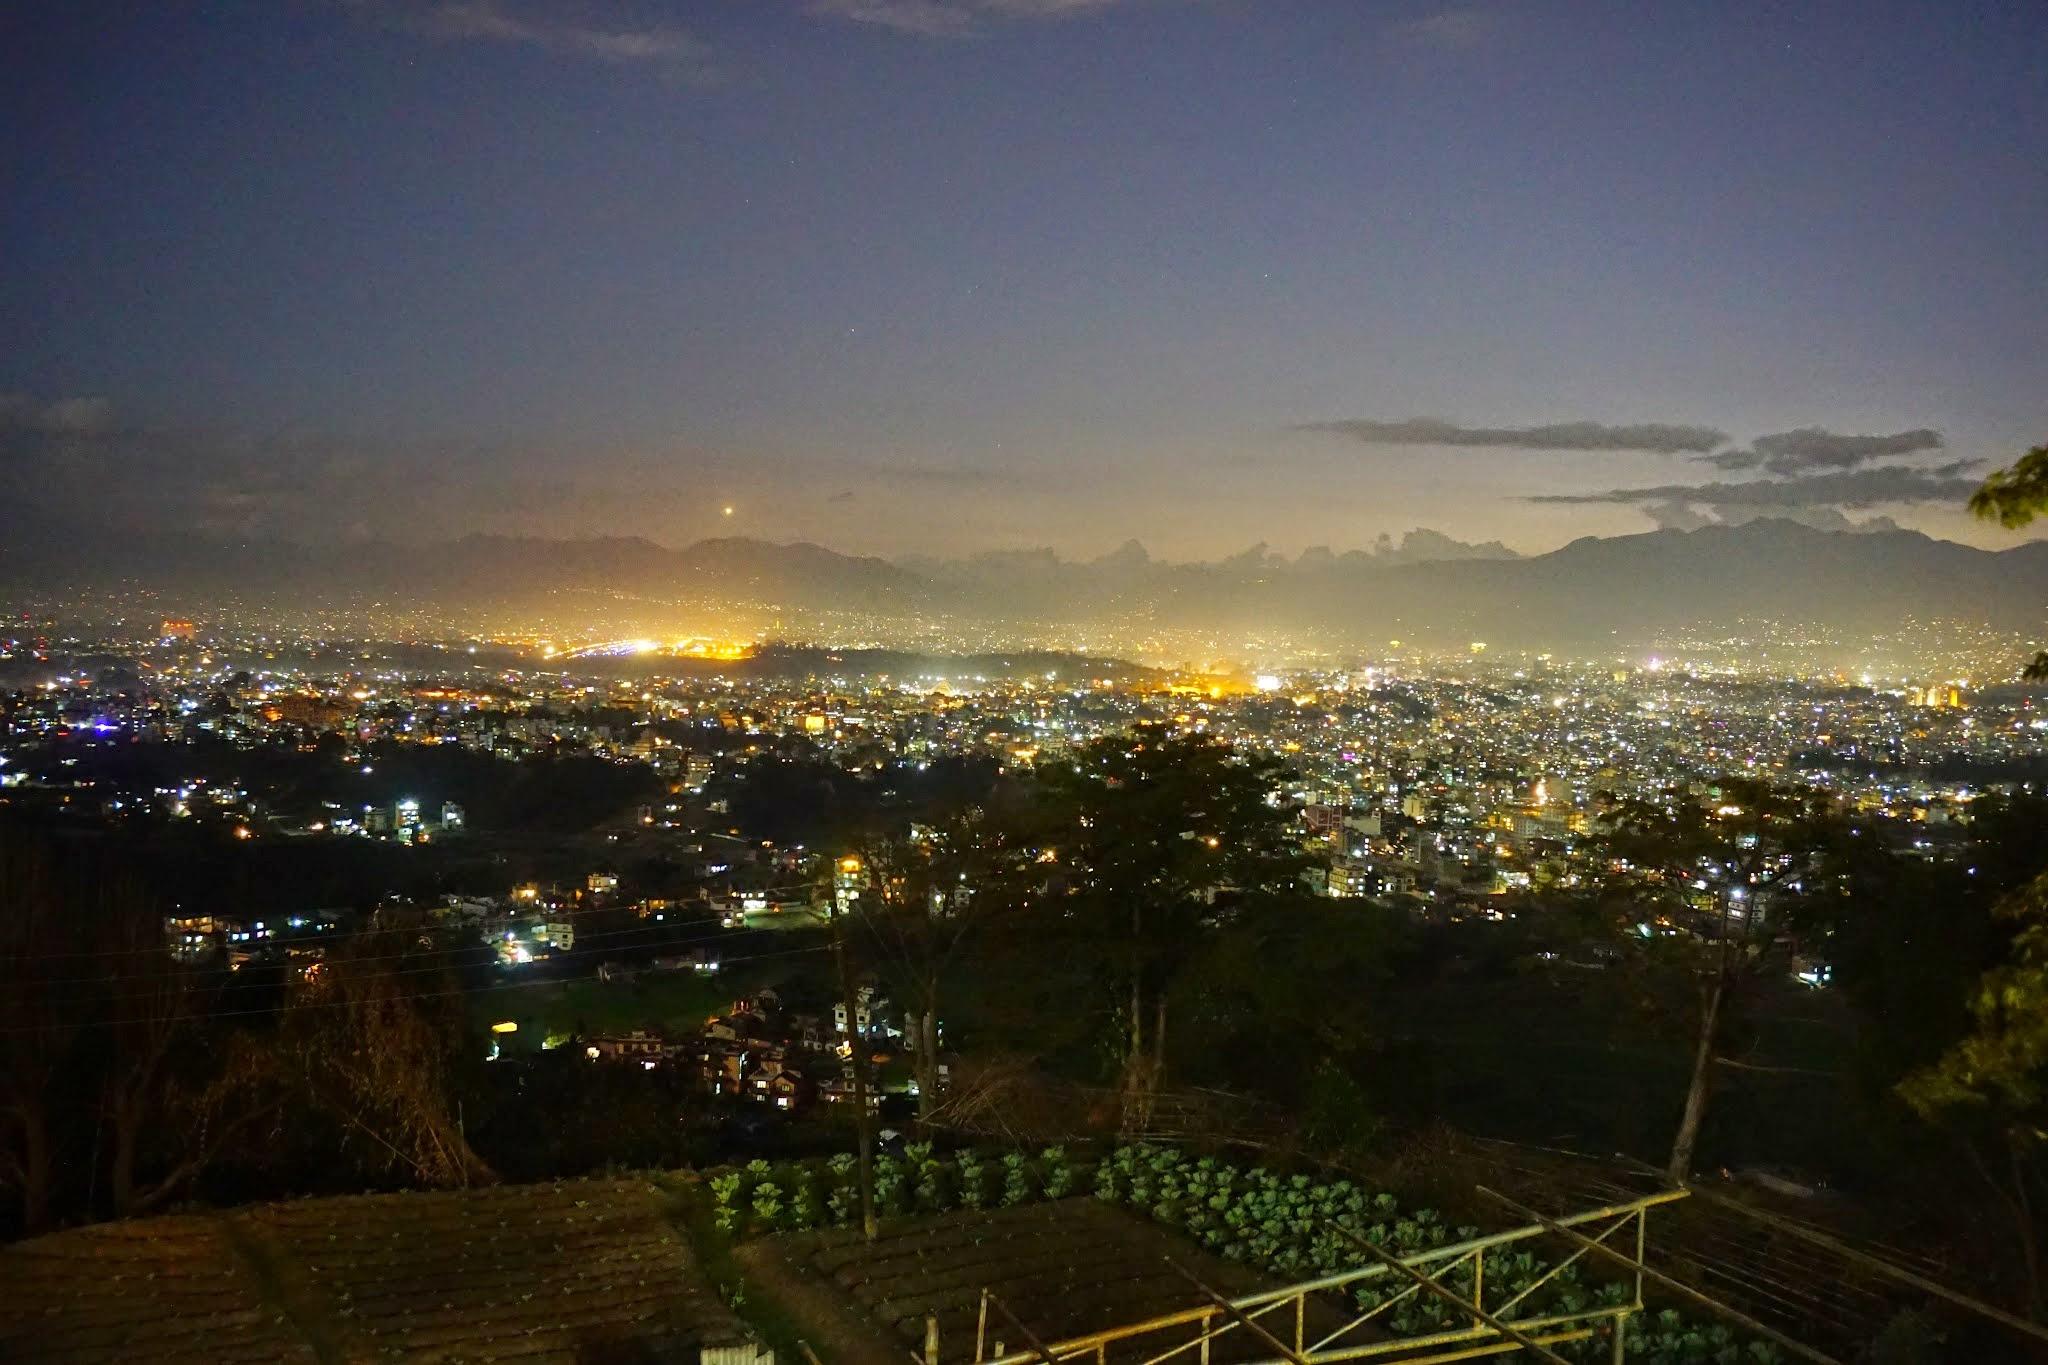 Photo: View of Boudha from Pullahari at night